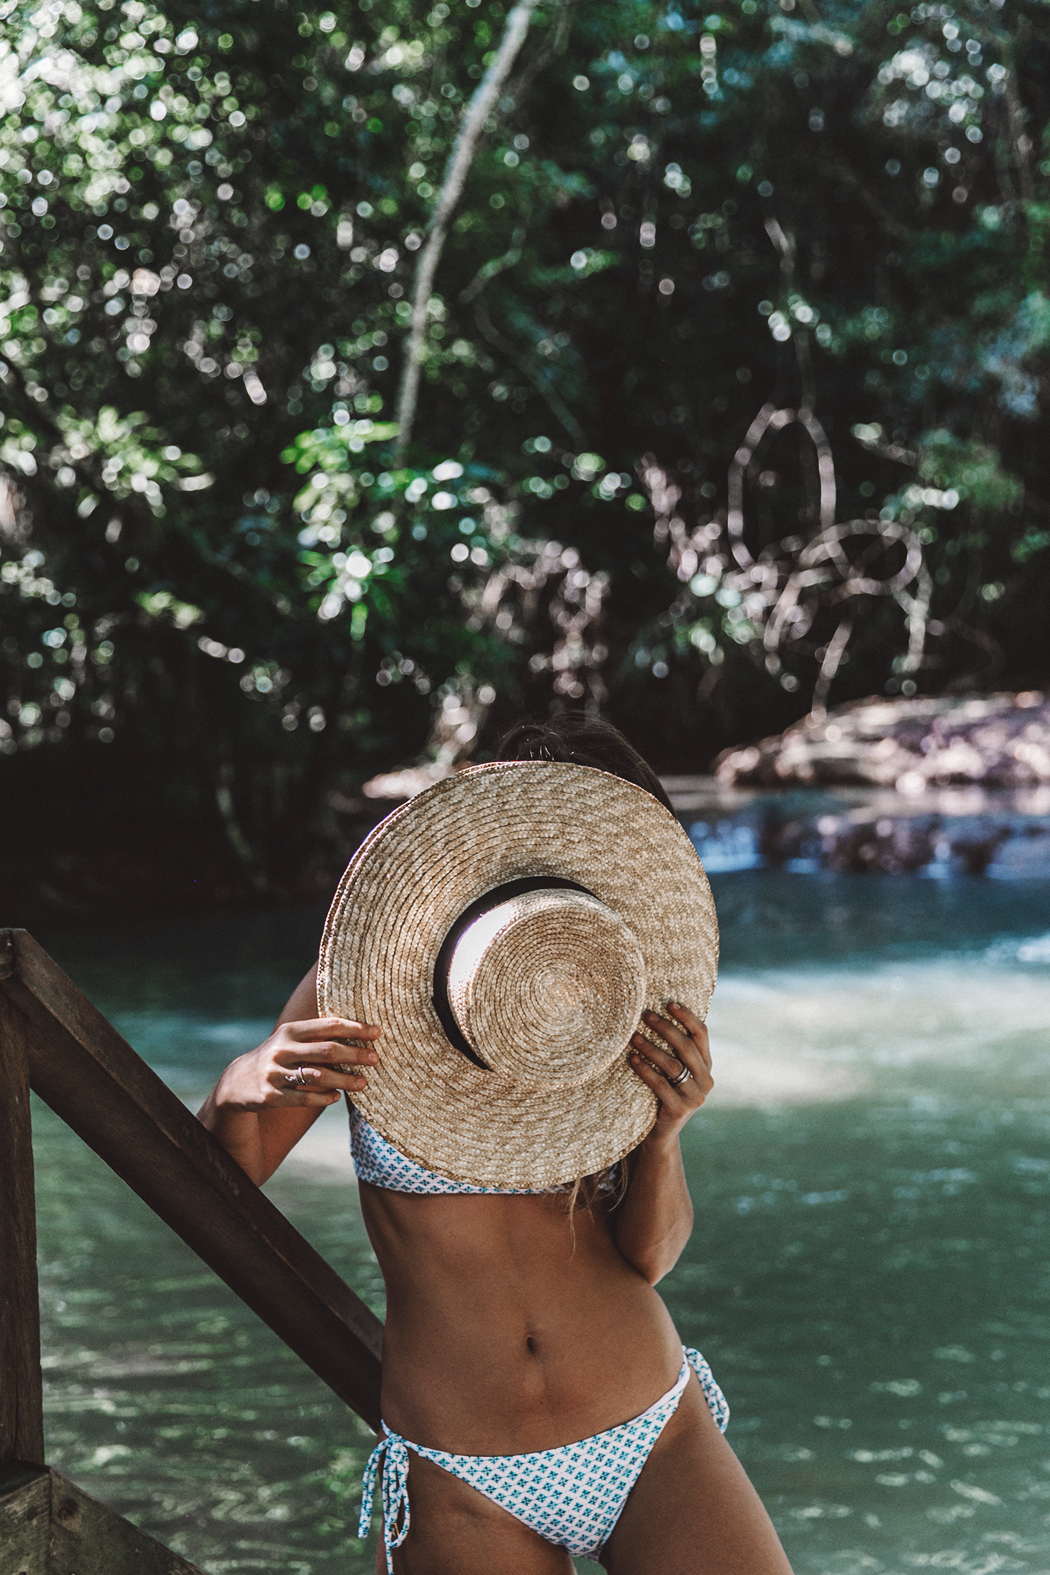 YS_FALLS-Jamaica-Peony_Swimwear-Lack_Of_Colors_Hat-Straw_Hat-Swimwear_Bikini-Outfit-20